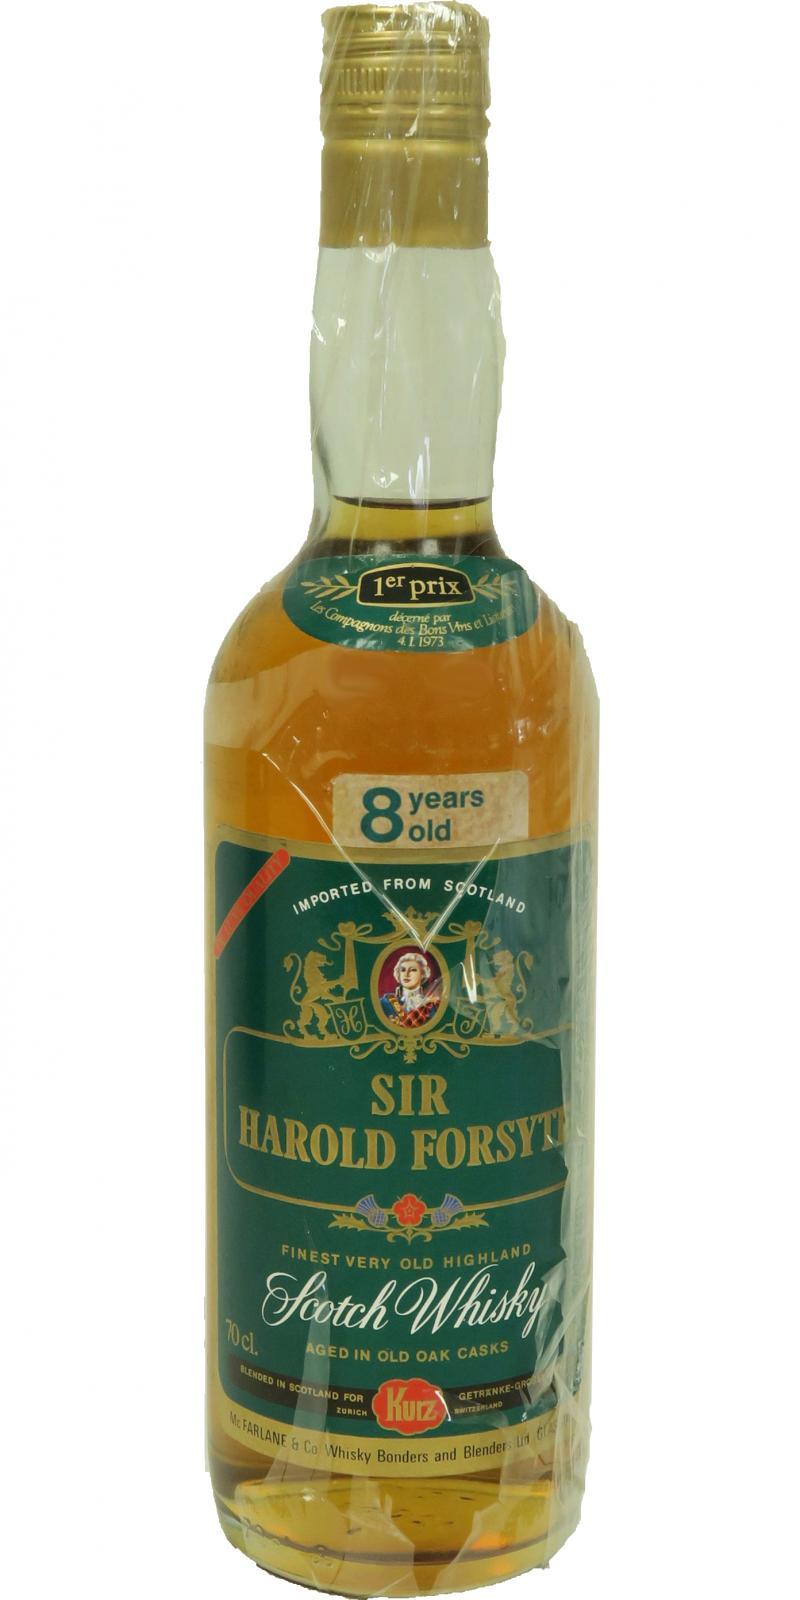 Sir Harold Forsyte 08-year-old